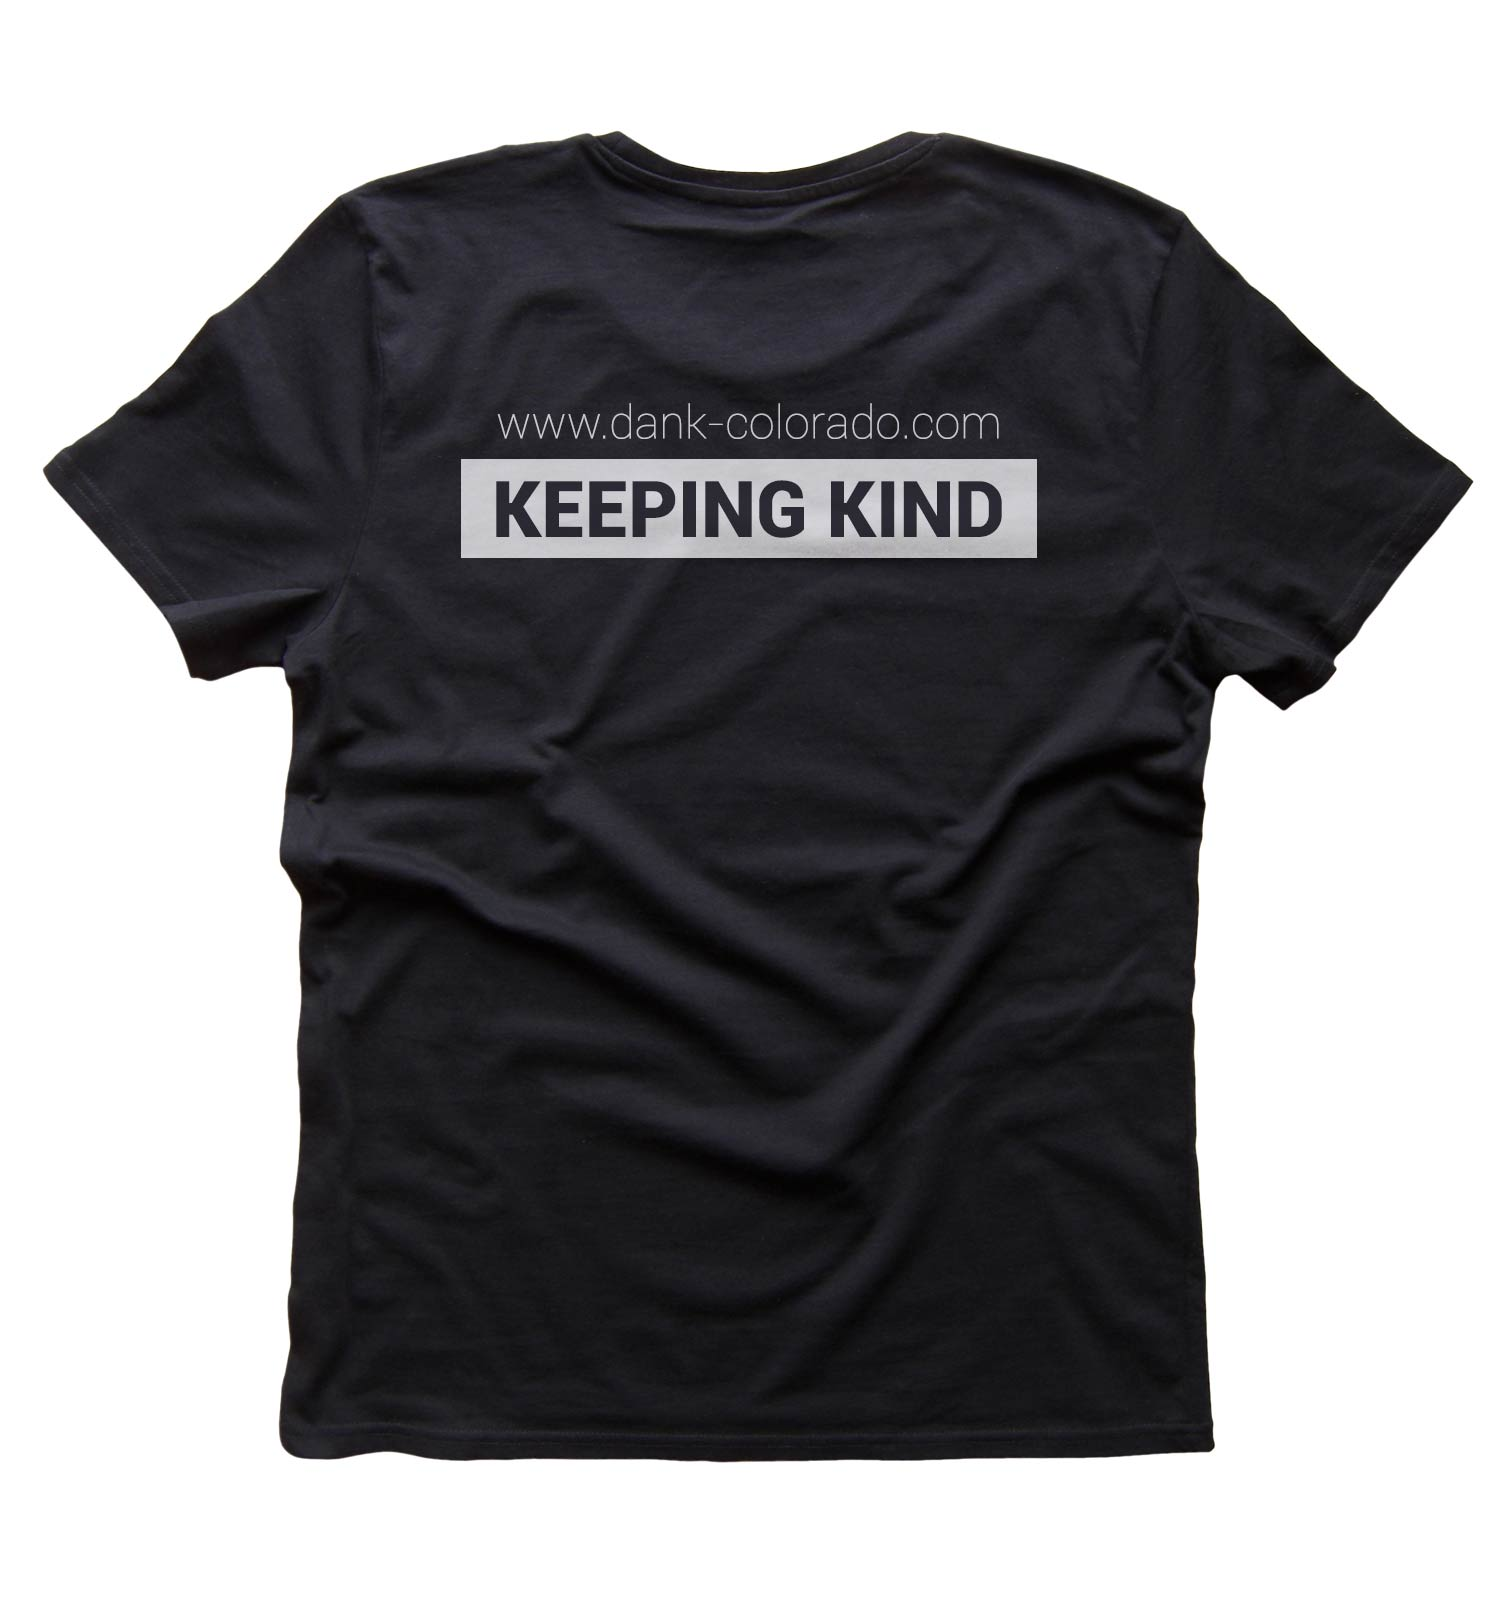 Free shirt giveaway